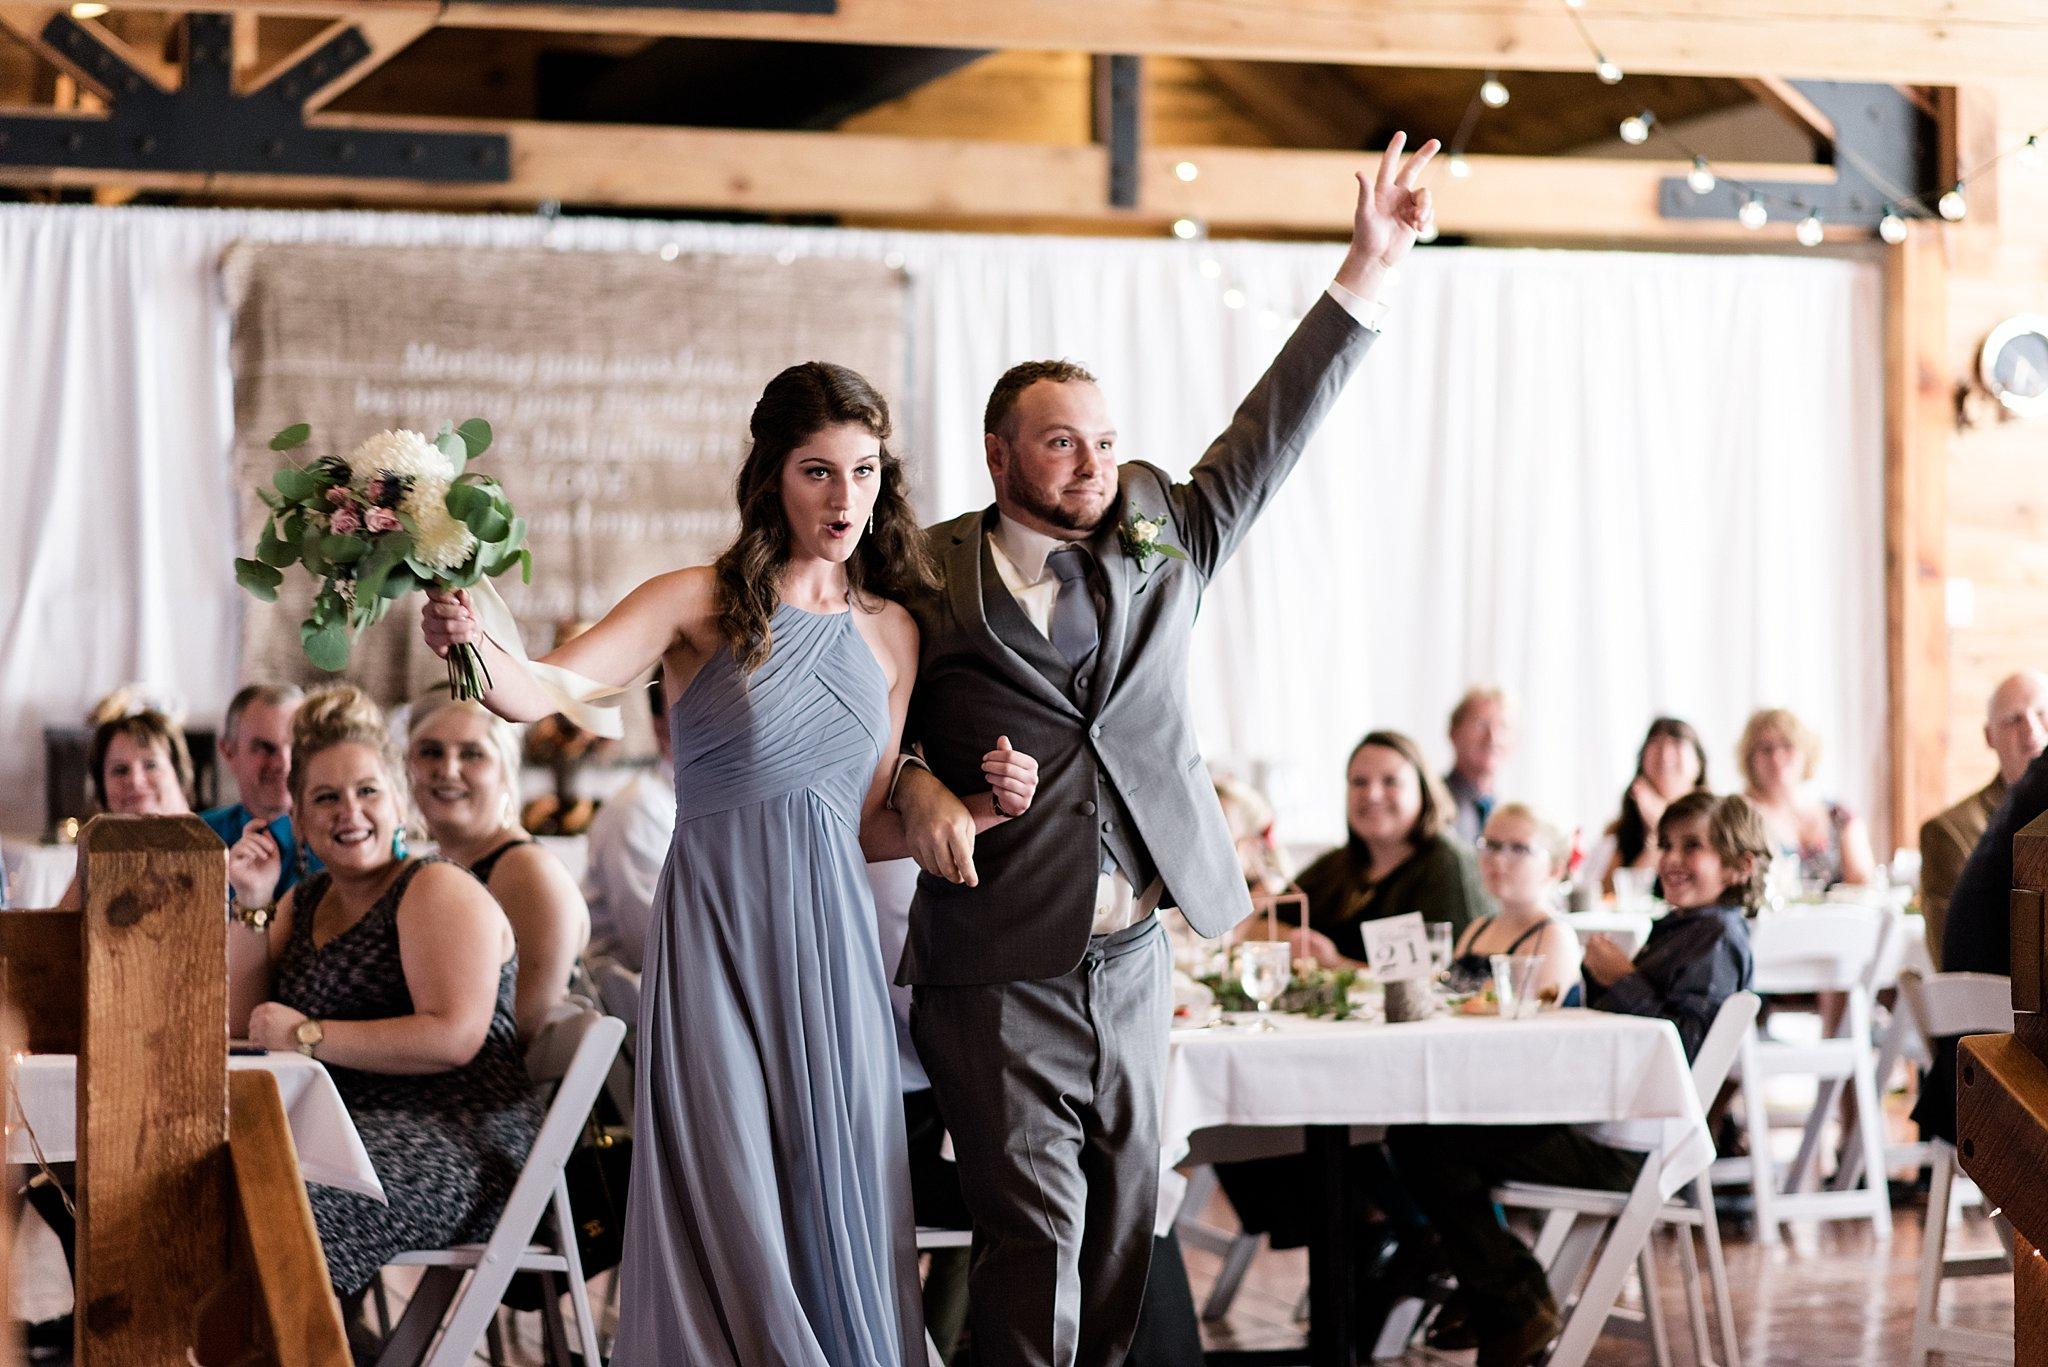 Cadillac-Michigan-wedding-caberfae-peaks-milwaukee-photographer_0072.jpg